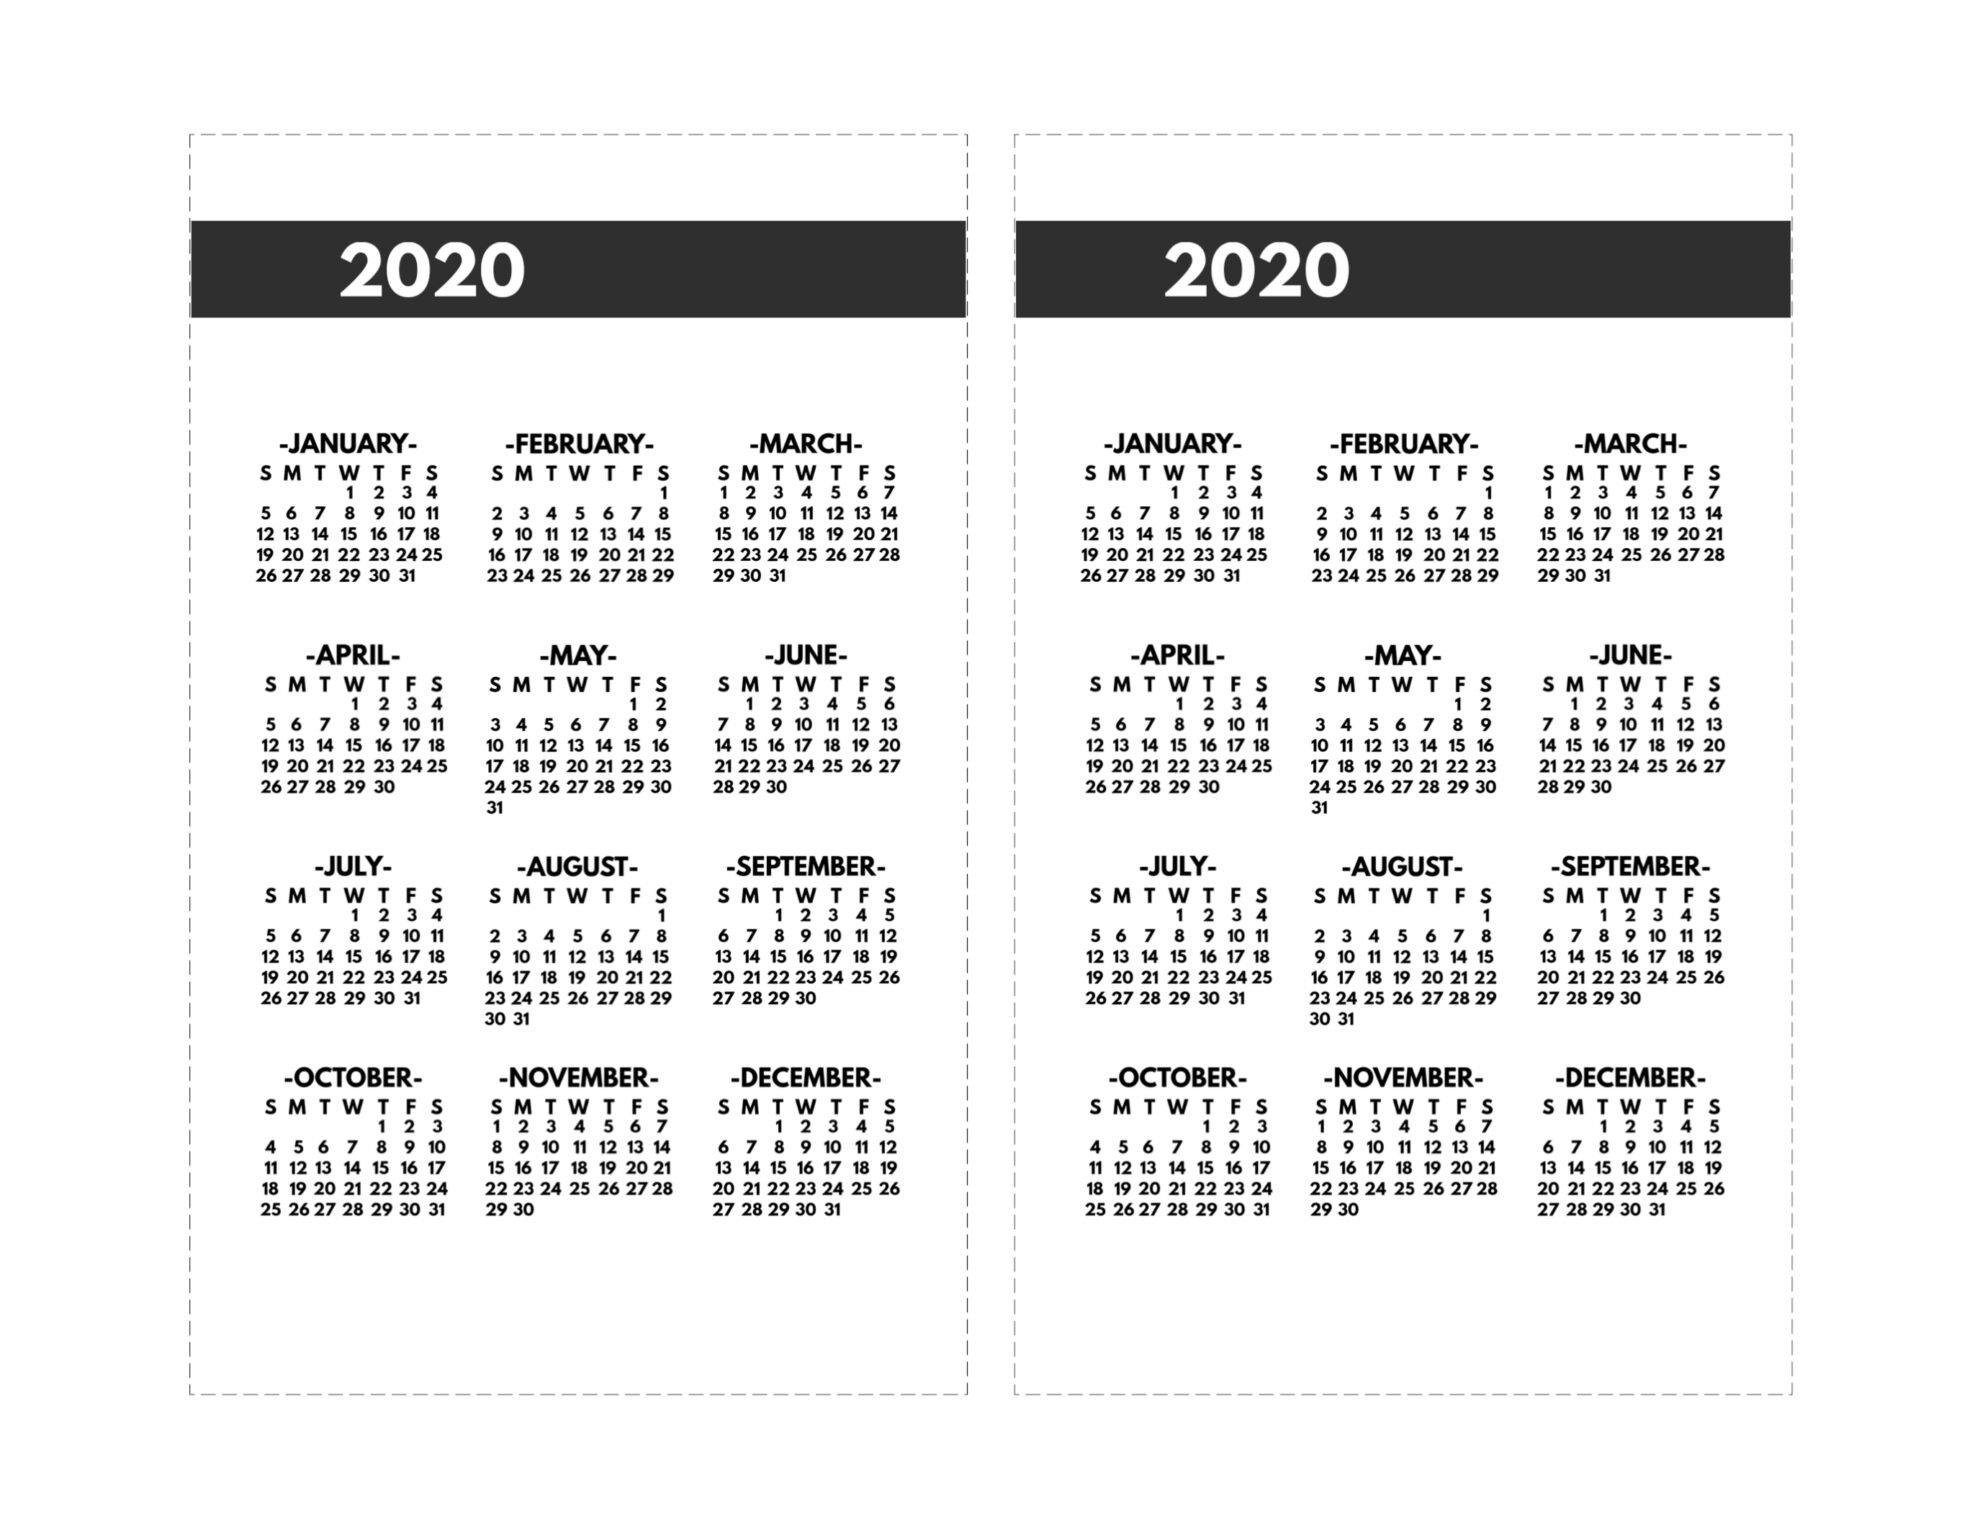 2020 Calendar 8 1/2 X 11 | Free Printable Calendar 8 And 1/2 By 11 Monthly Printabe Calendar